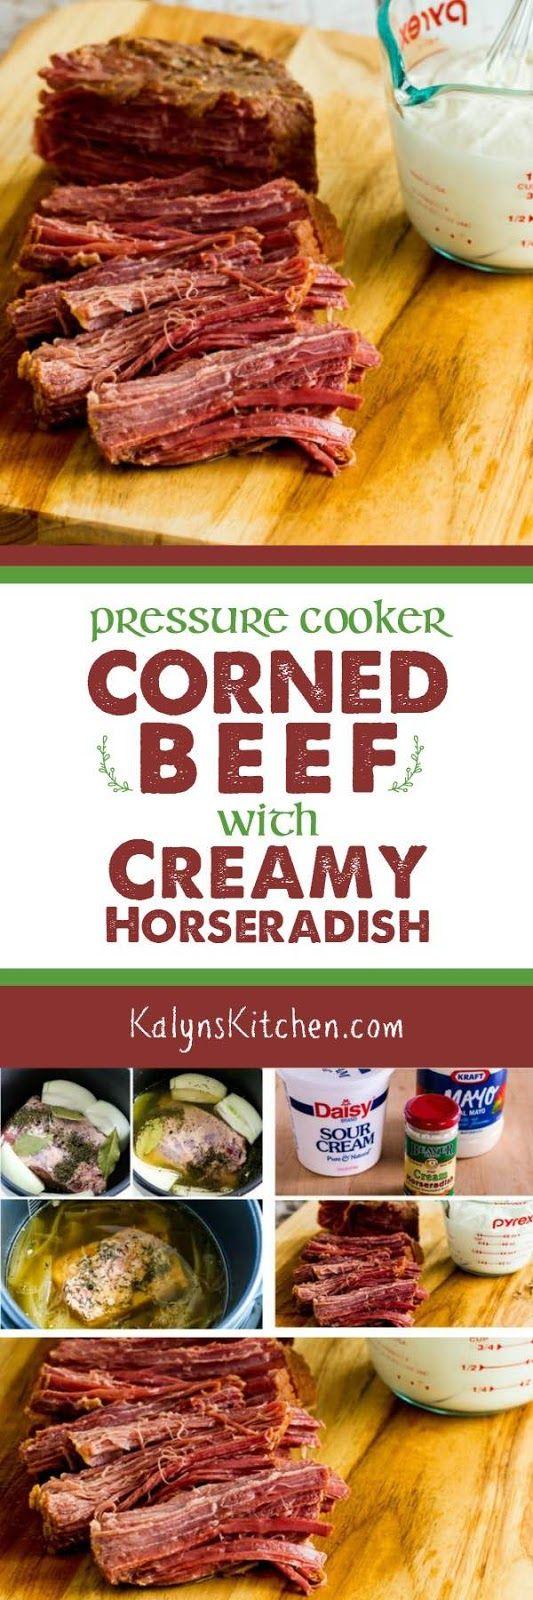 Pressure Cooker Corned Beef with Creamy Horseradish Sauce found on KalynsKitchen.com